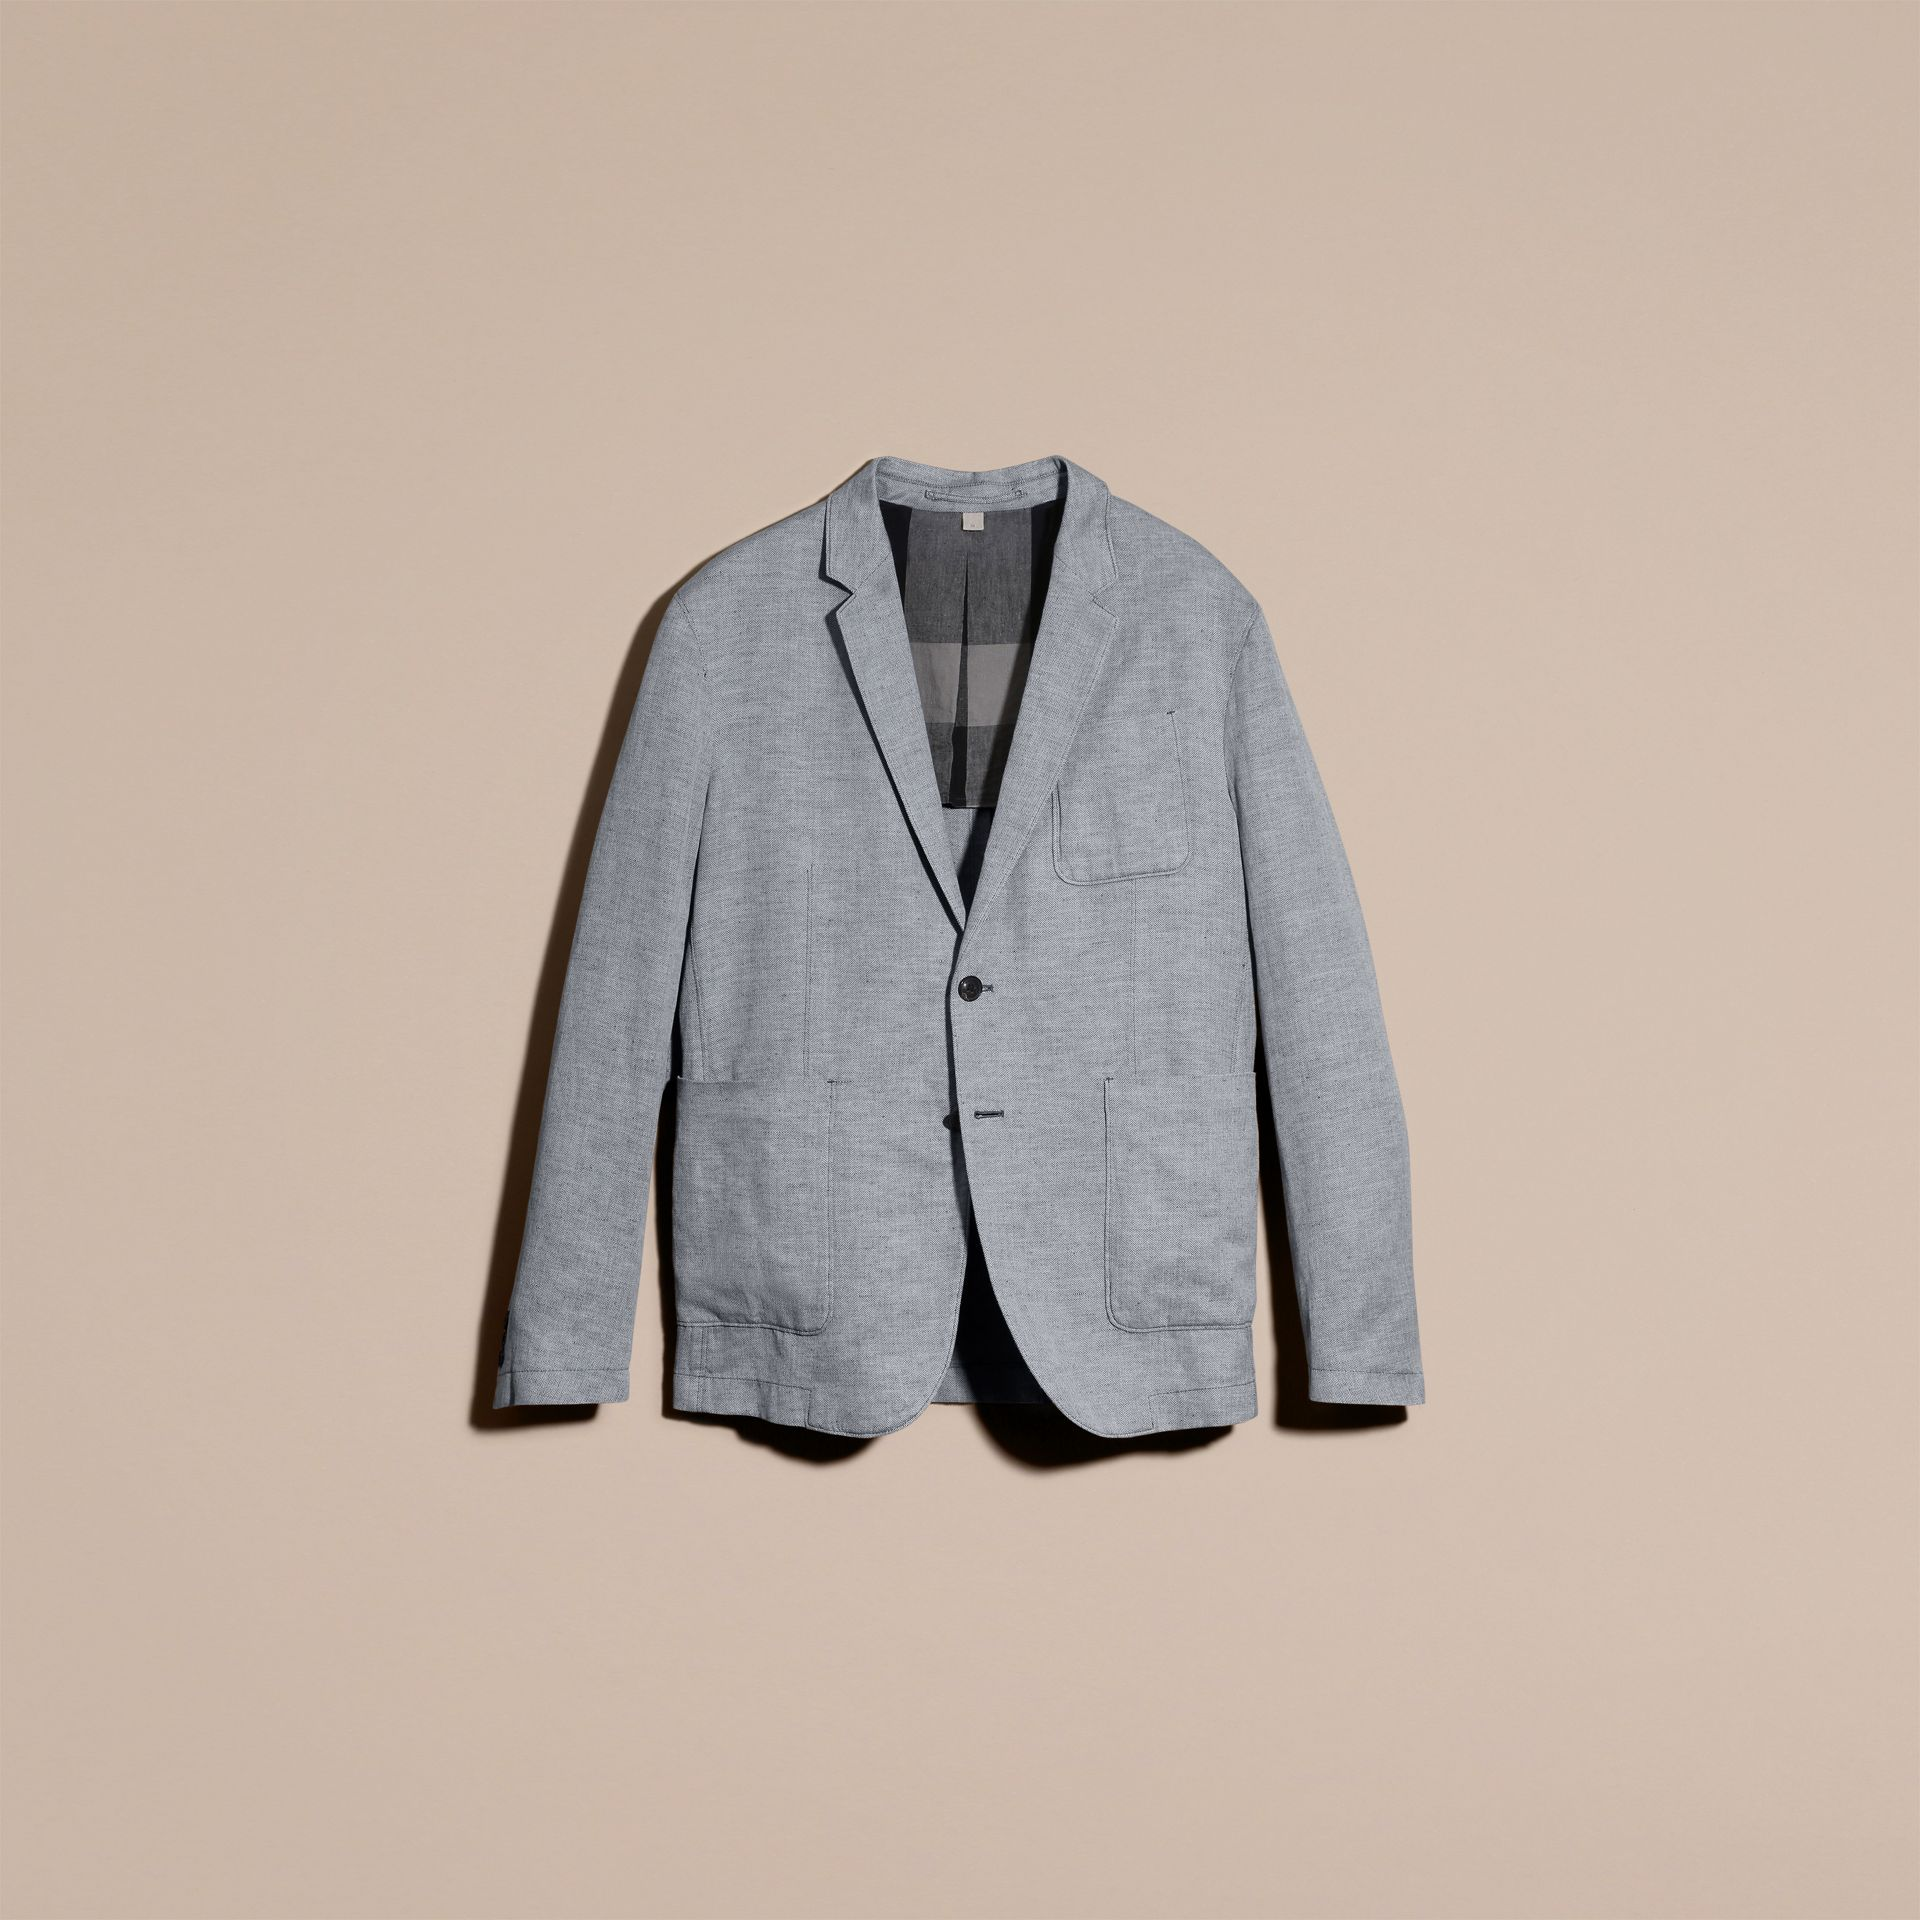 Pale blue Herringbone Linen Cotton Tailored Jacket Pale Blue - gallery image 4